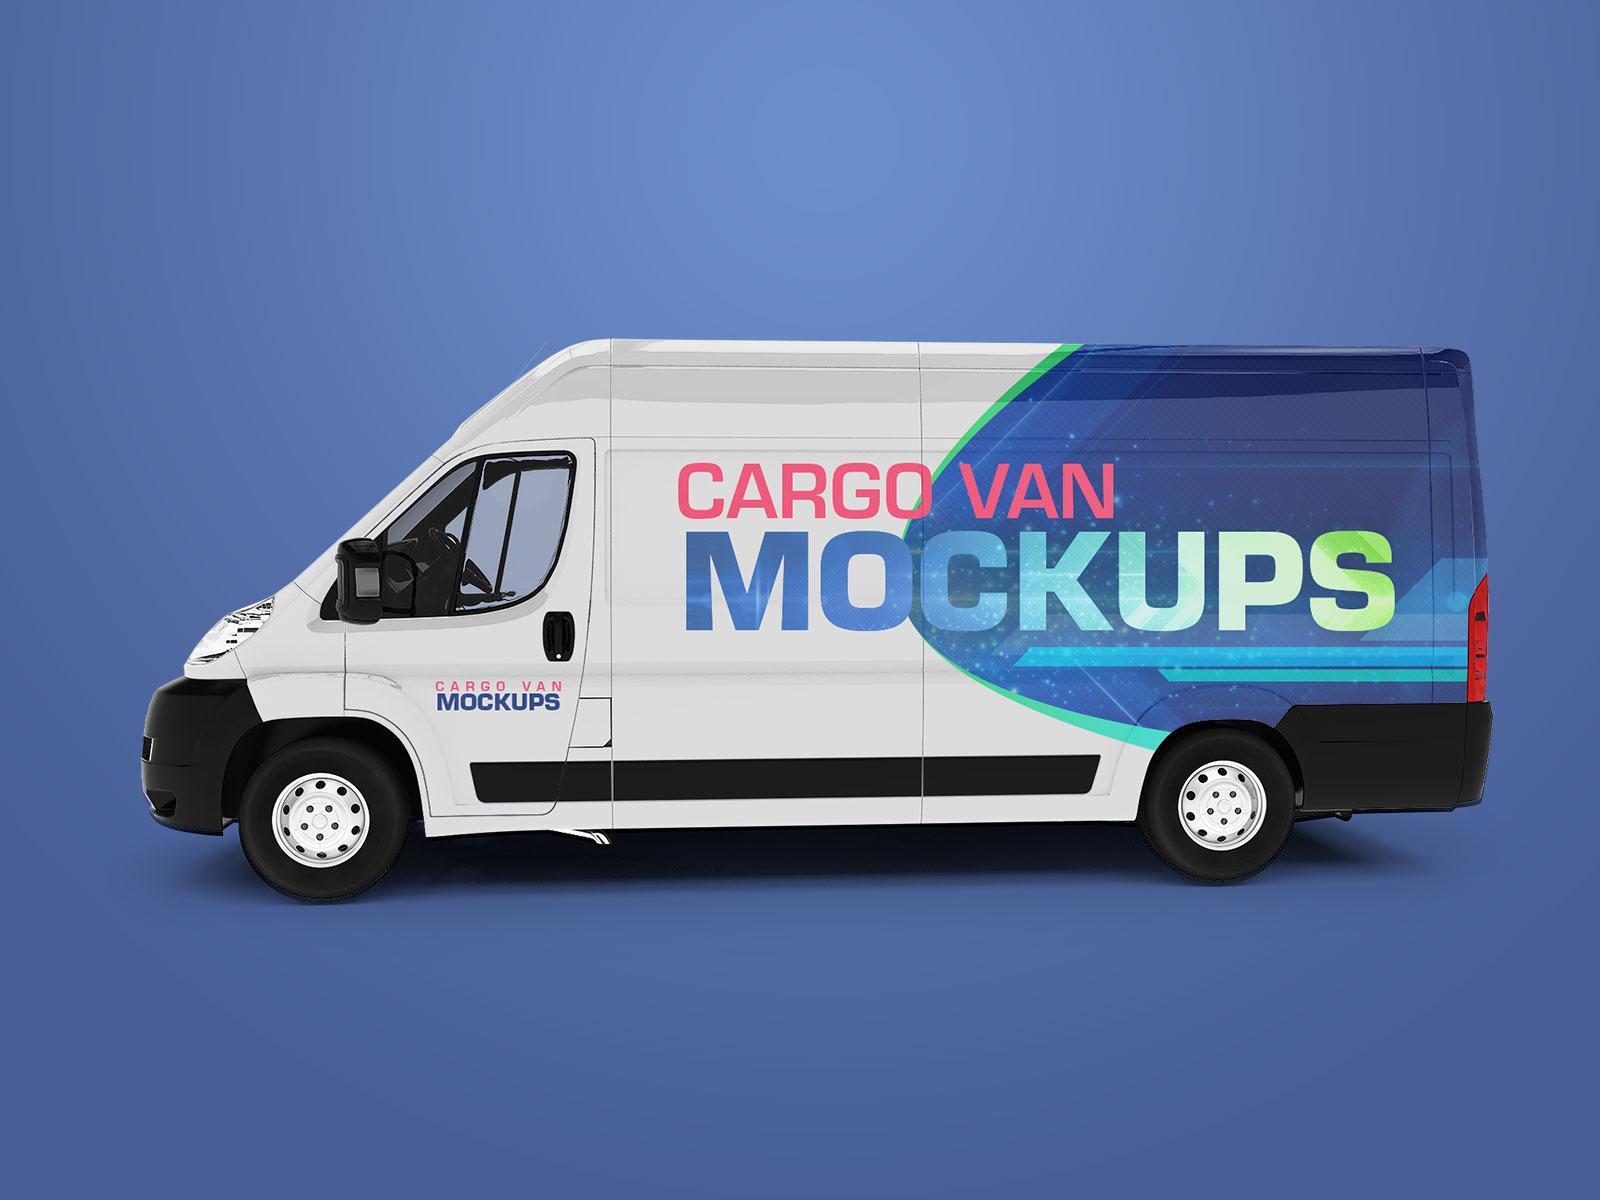 Free-Cargo-Express-Van-Mockup-PSD-3